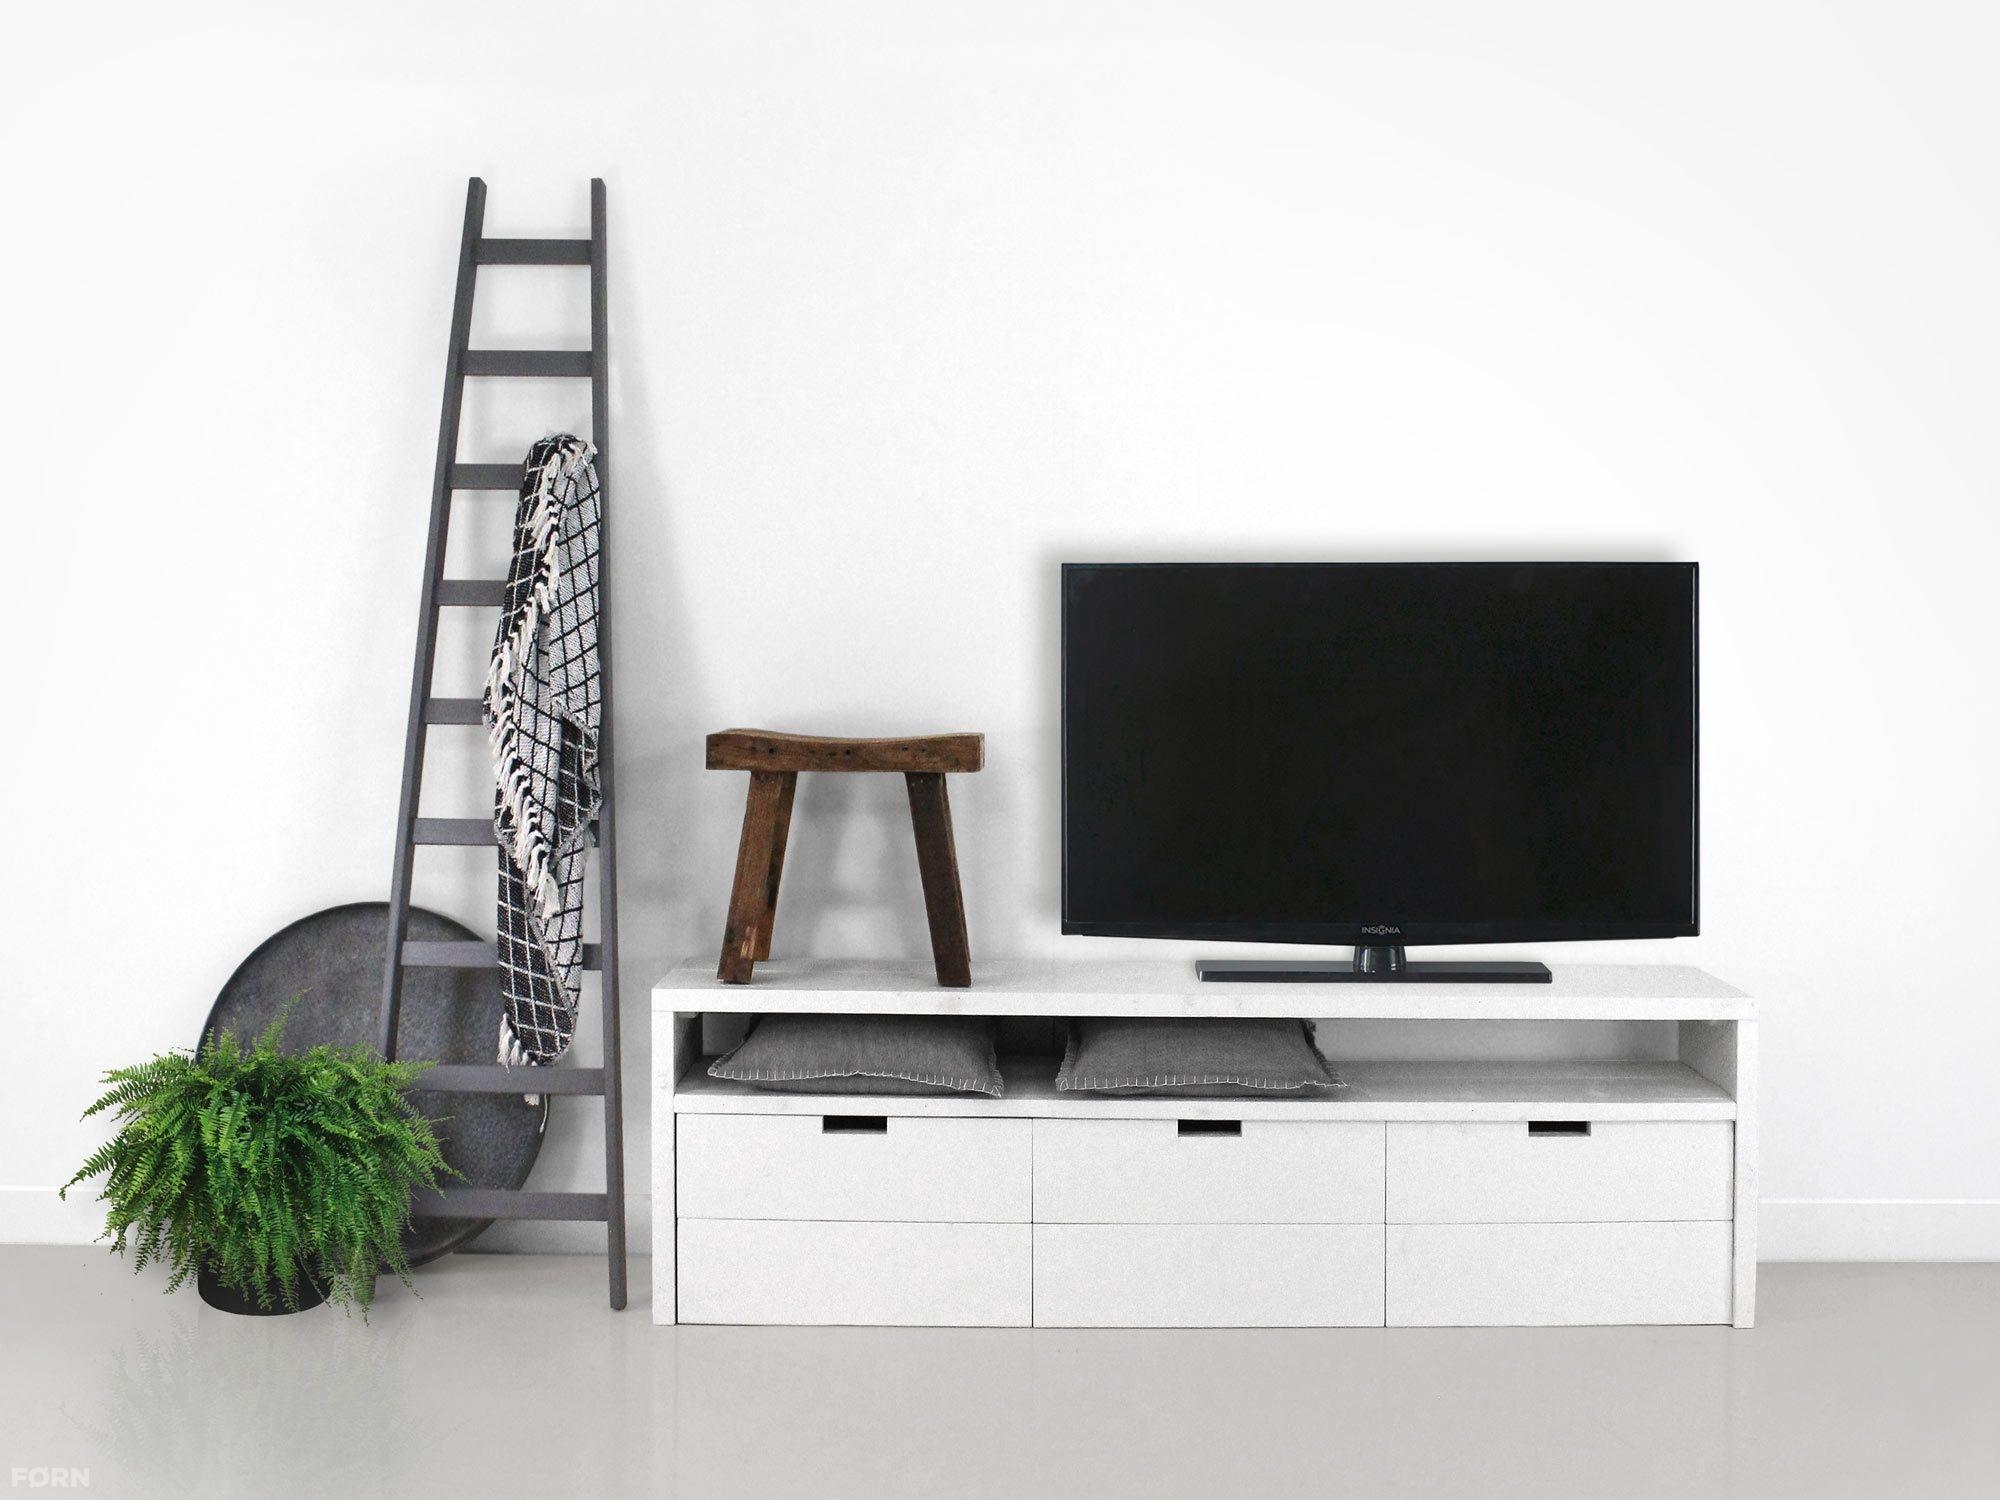 Kleine Tv Meubel : Steigerhouten sidetable met handige rol lades steigerhouten meubels